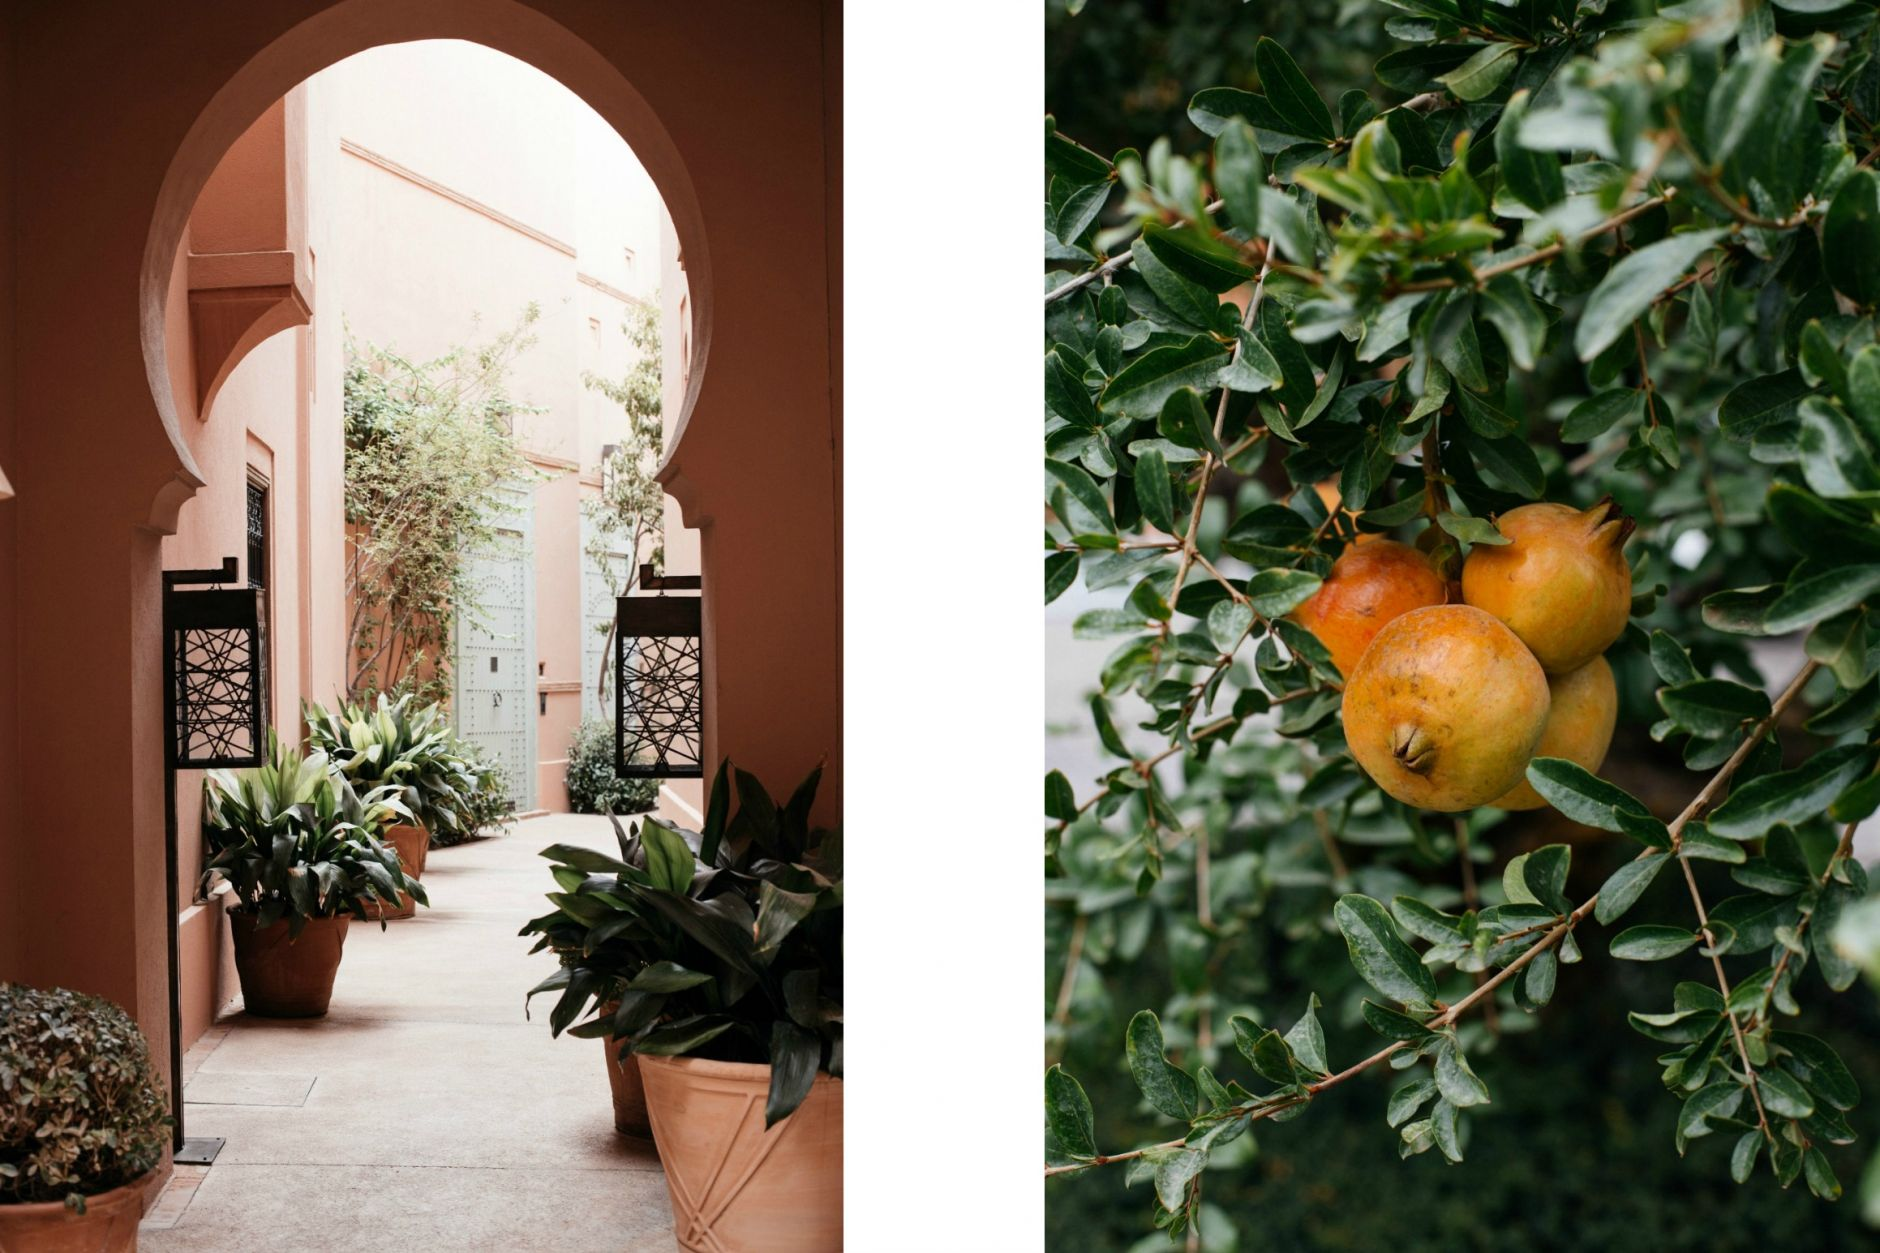 royal-mansour-hotel-luxury-marrakesch-marrakesh-morocco-edisa-shahini-disicouture-blog-duo-05